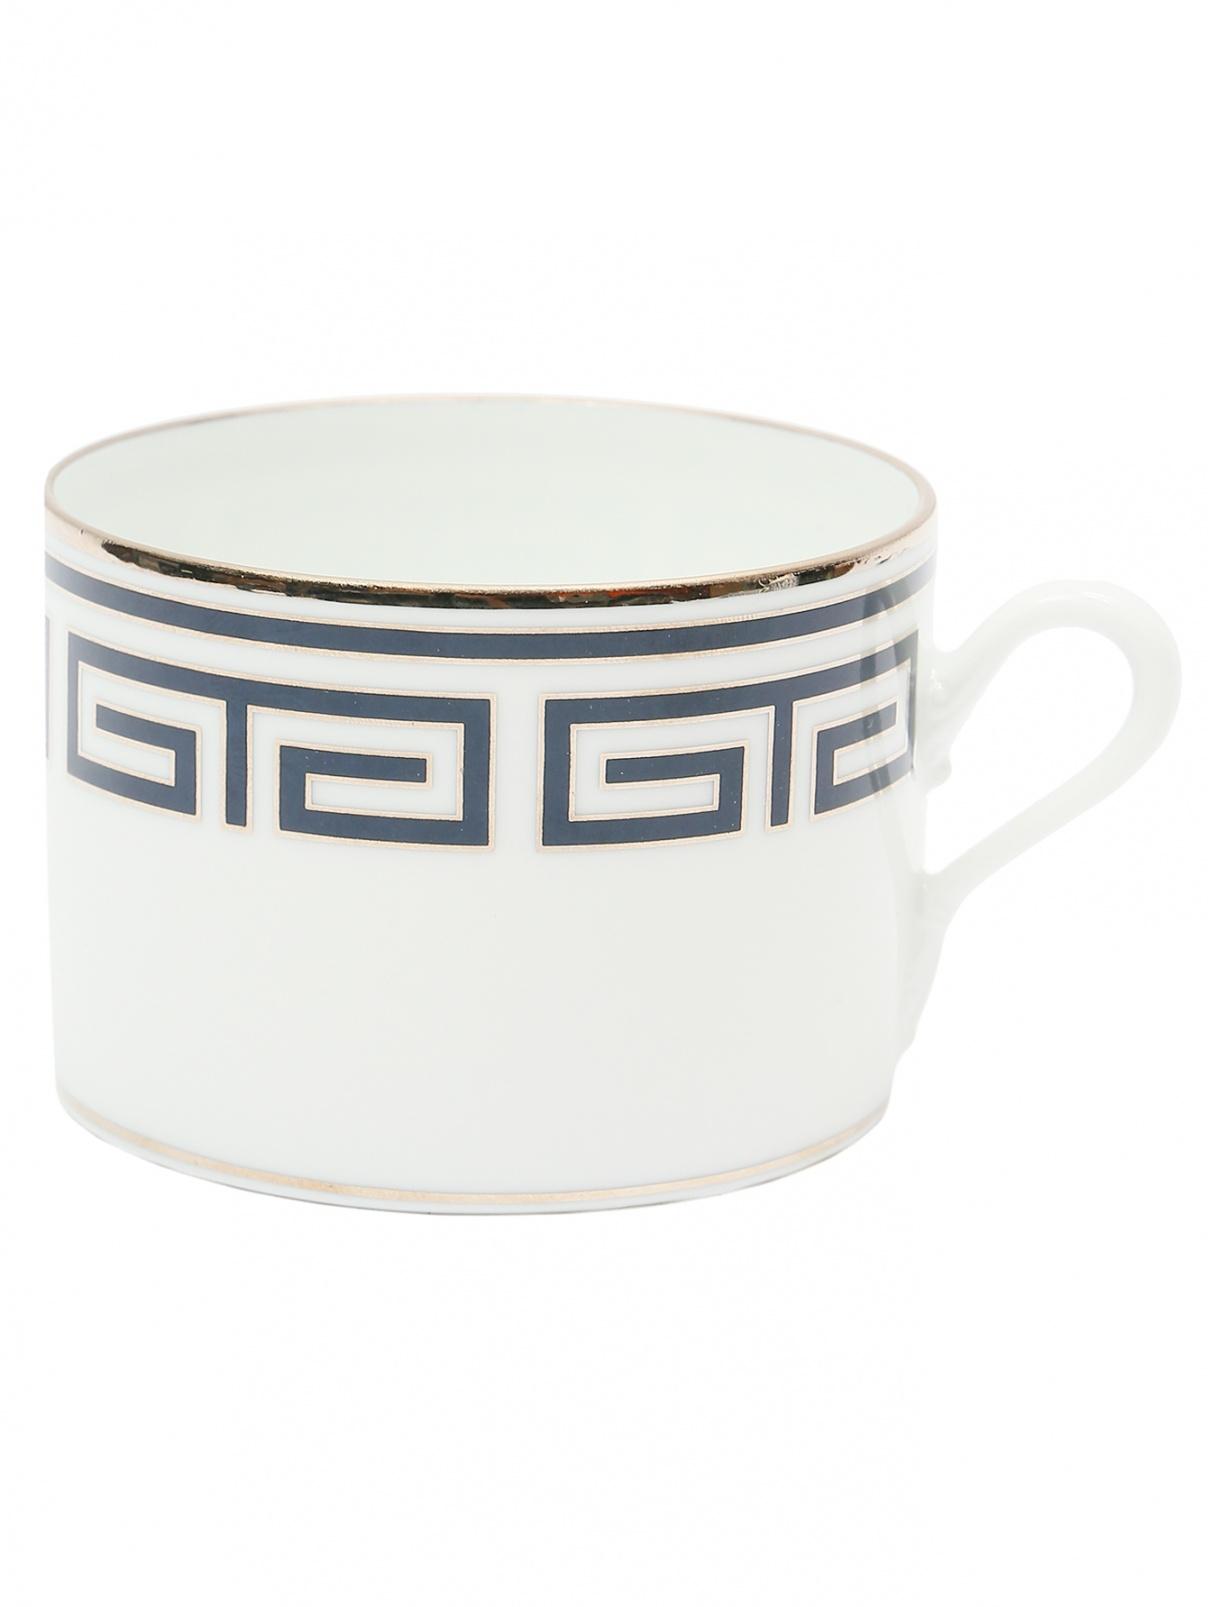 Чайная чашка 7 x 5 Richard Ginori 1735  –  Общий вид